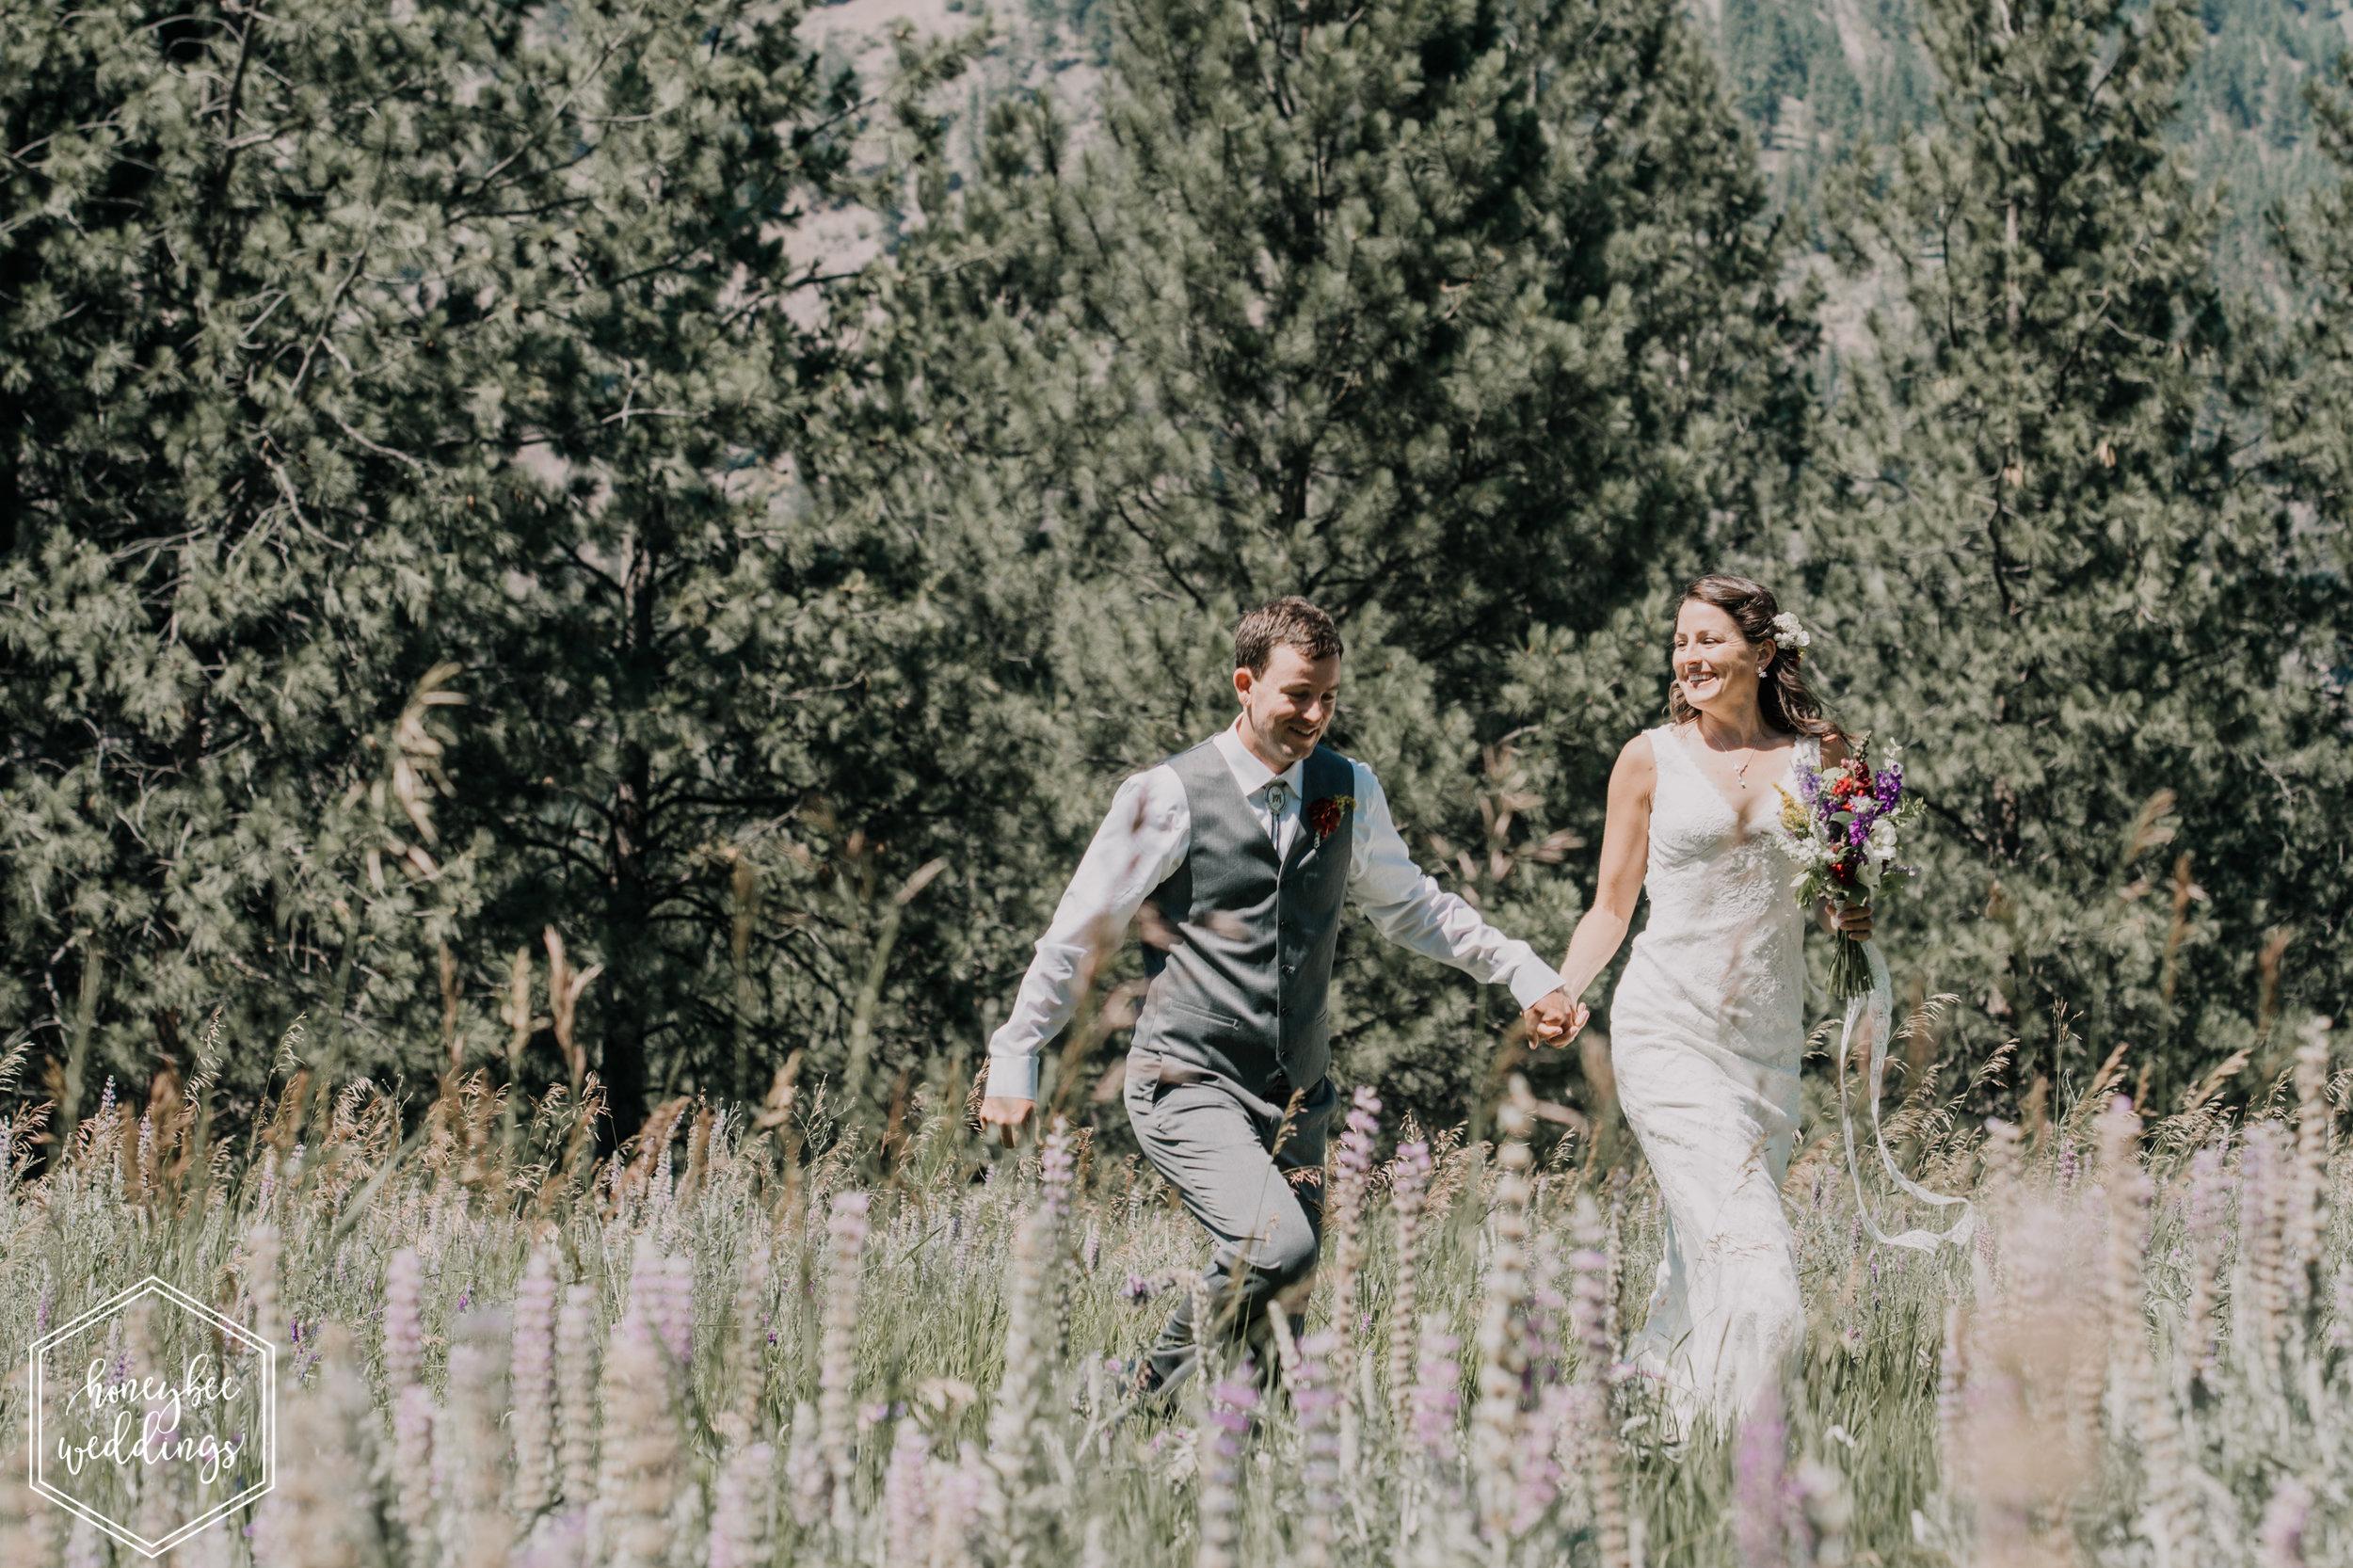 109 White Raven Wedding_Montana Wedding Photographer_Honeybee Weddings_ Meghan Maloney + Arza Hammond 2018-9260-2.jpg